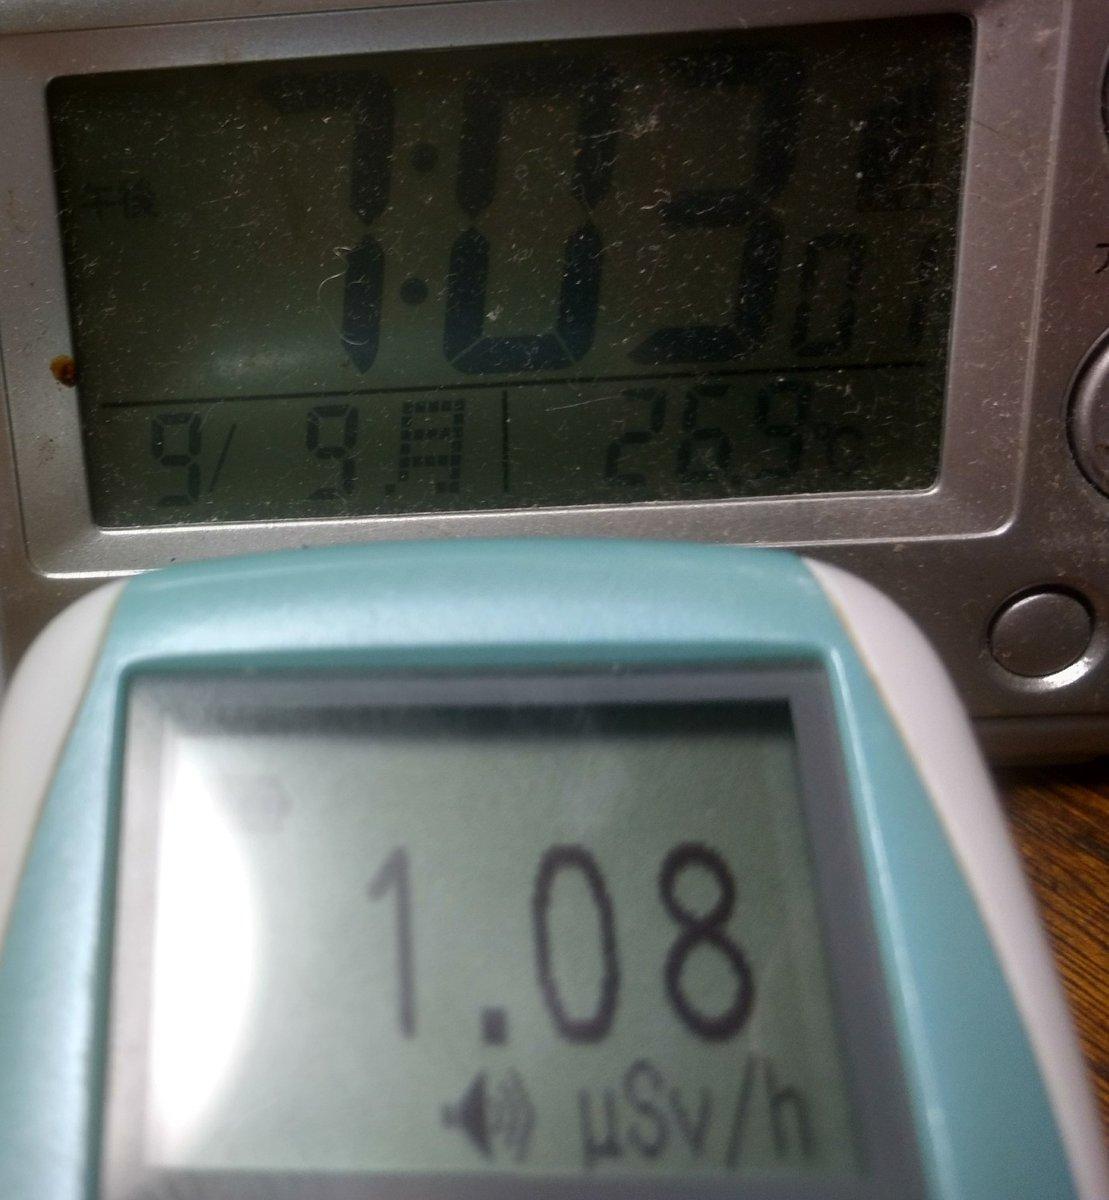 test ツイッターメディア - @SoshinBC_PR @christweekly @jcgm_official @komei_koho @komei_woman @yamaguchinatsuoサイレントソースアタック無差別放射能汚染テロされていますよ。まあテロ組織が家の中を汚染している放射線量に比べれば微量ですけど。 https://t.co/mZ9OIPHJ48